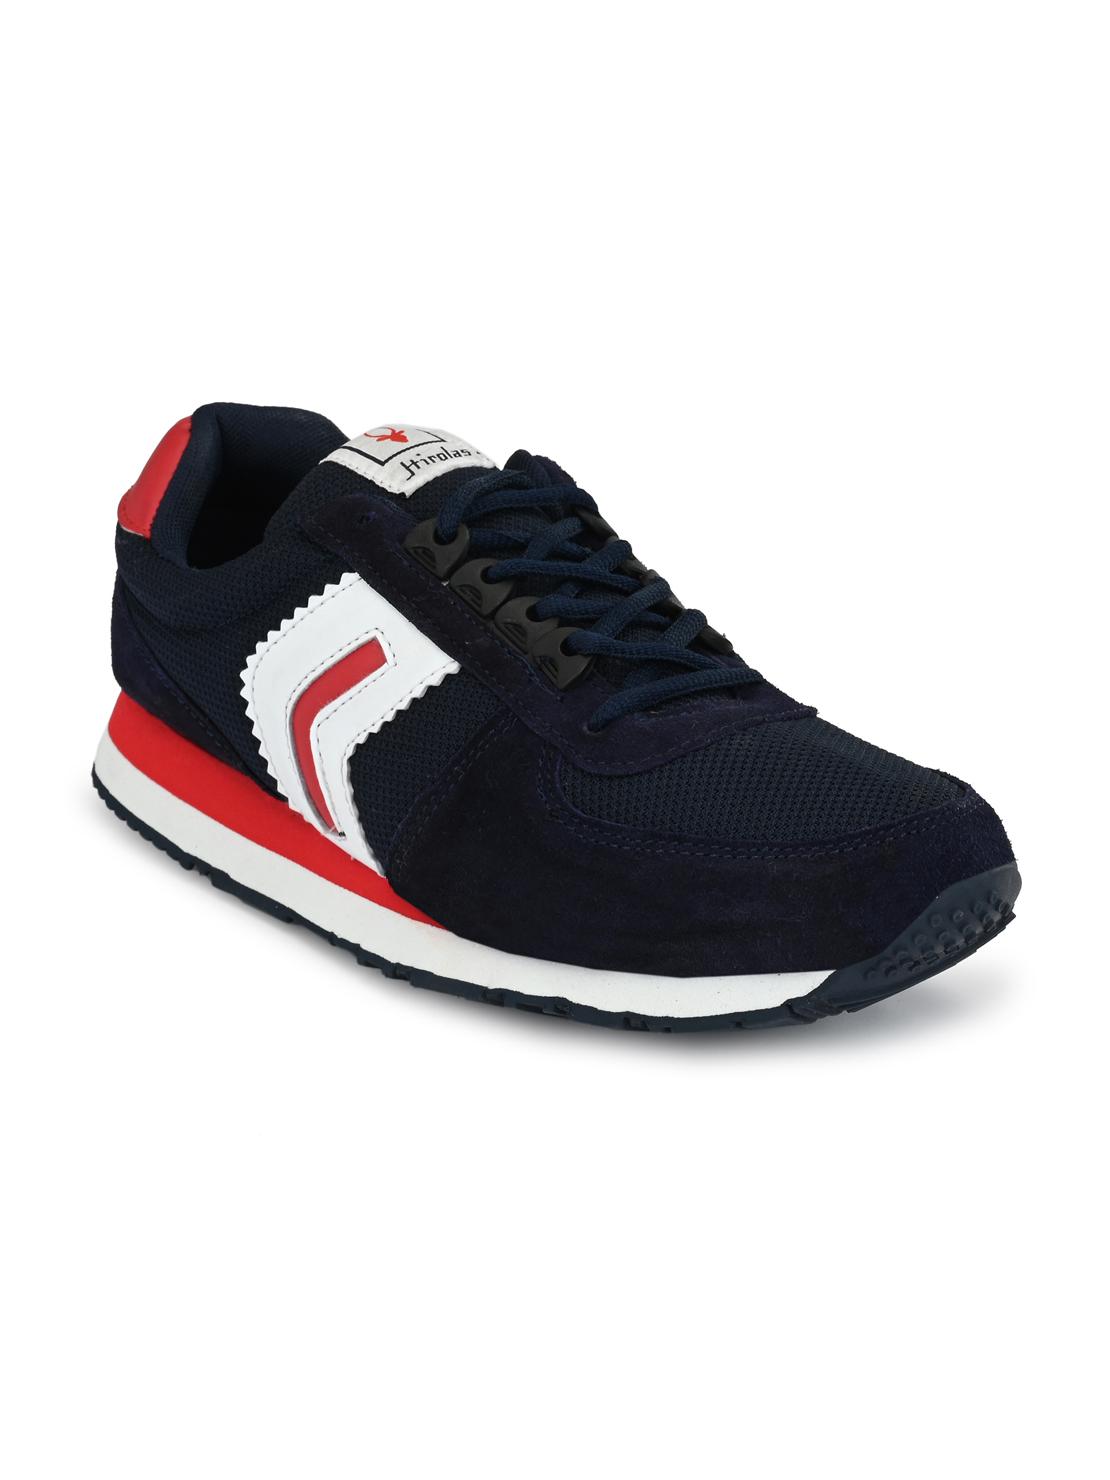 Hirolas | Hirolas Men's Multisport Leather Sneaker Shoes- Blue/Red